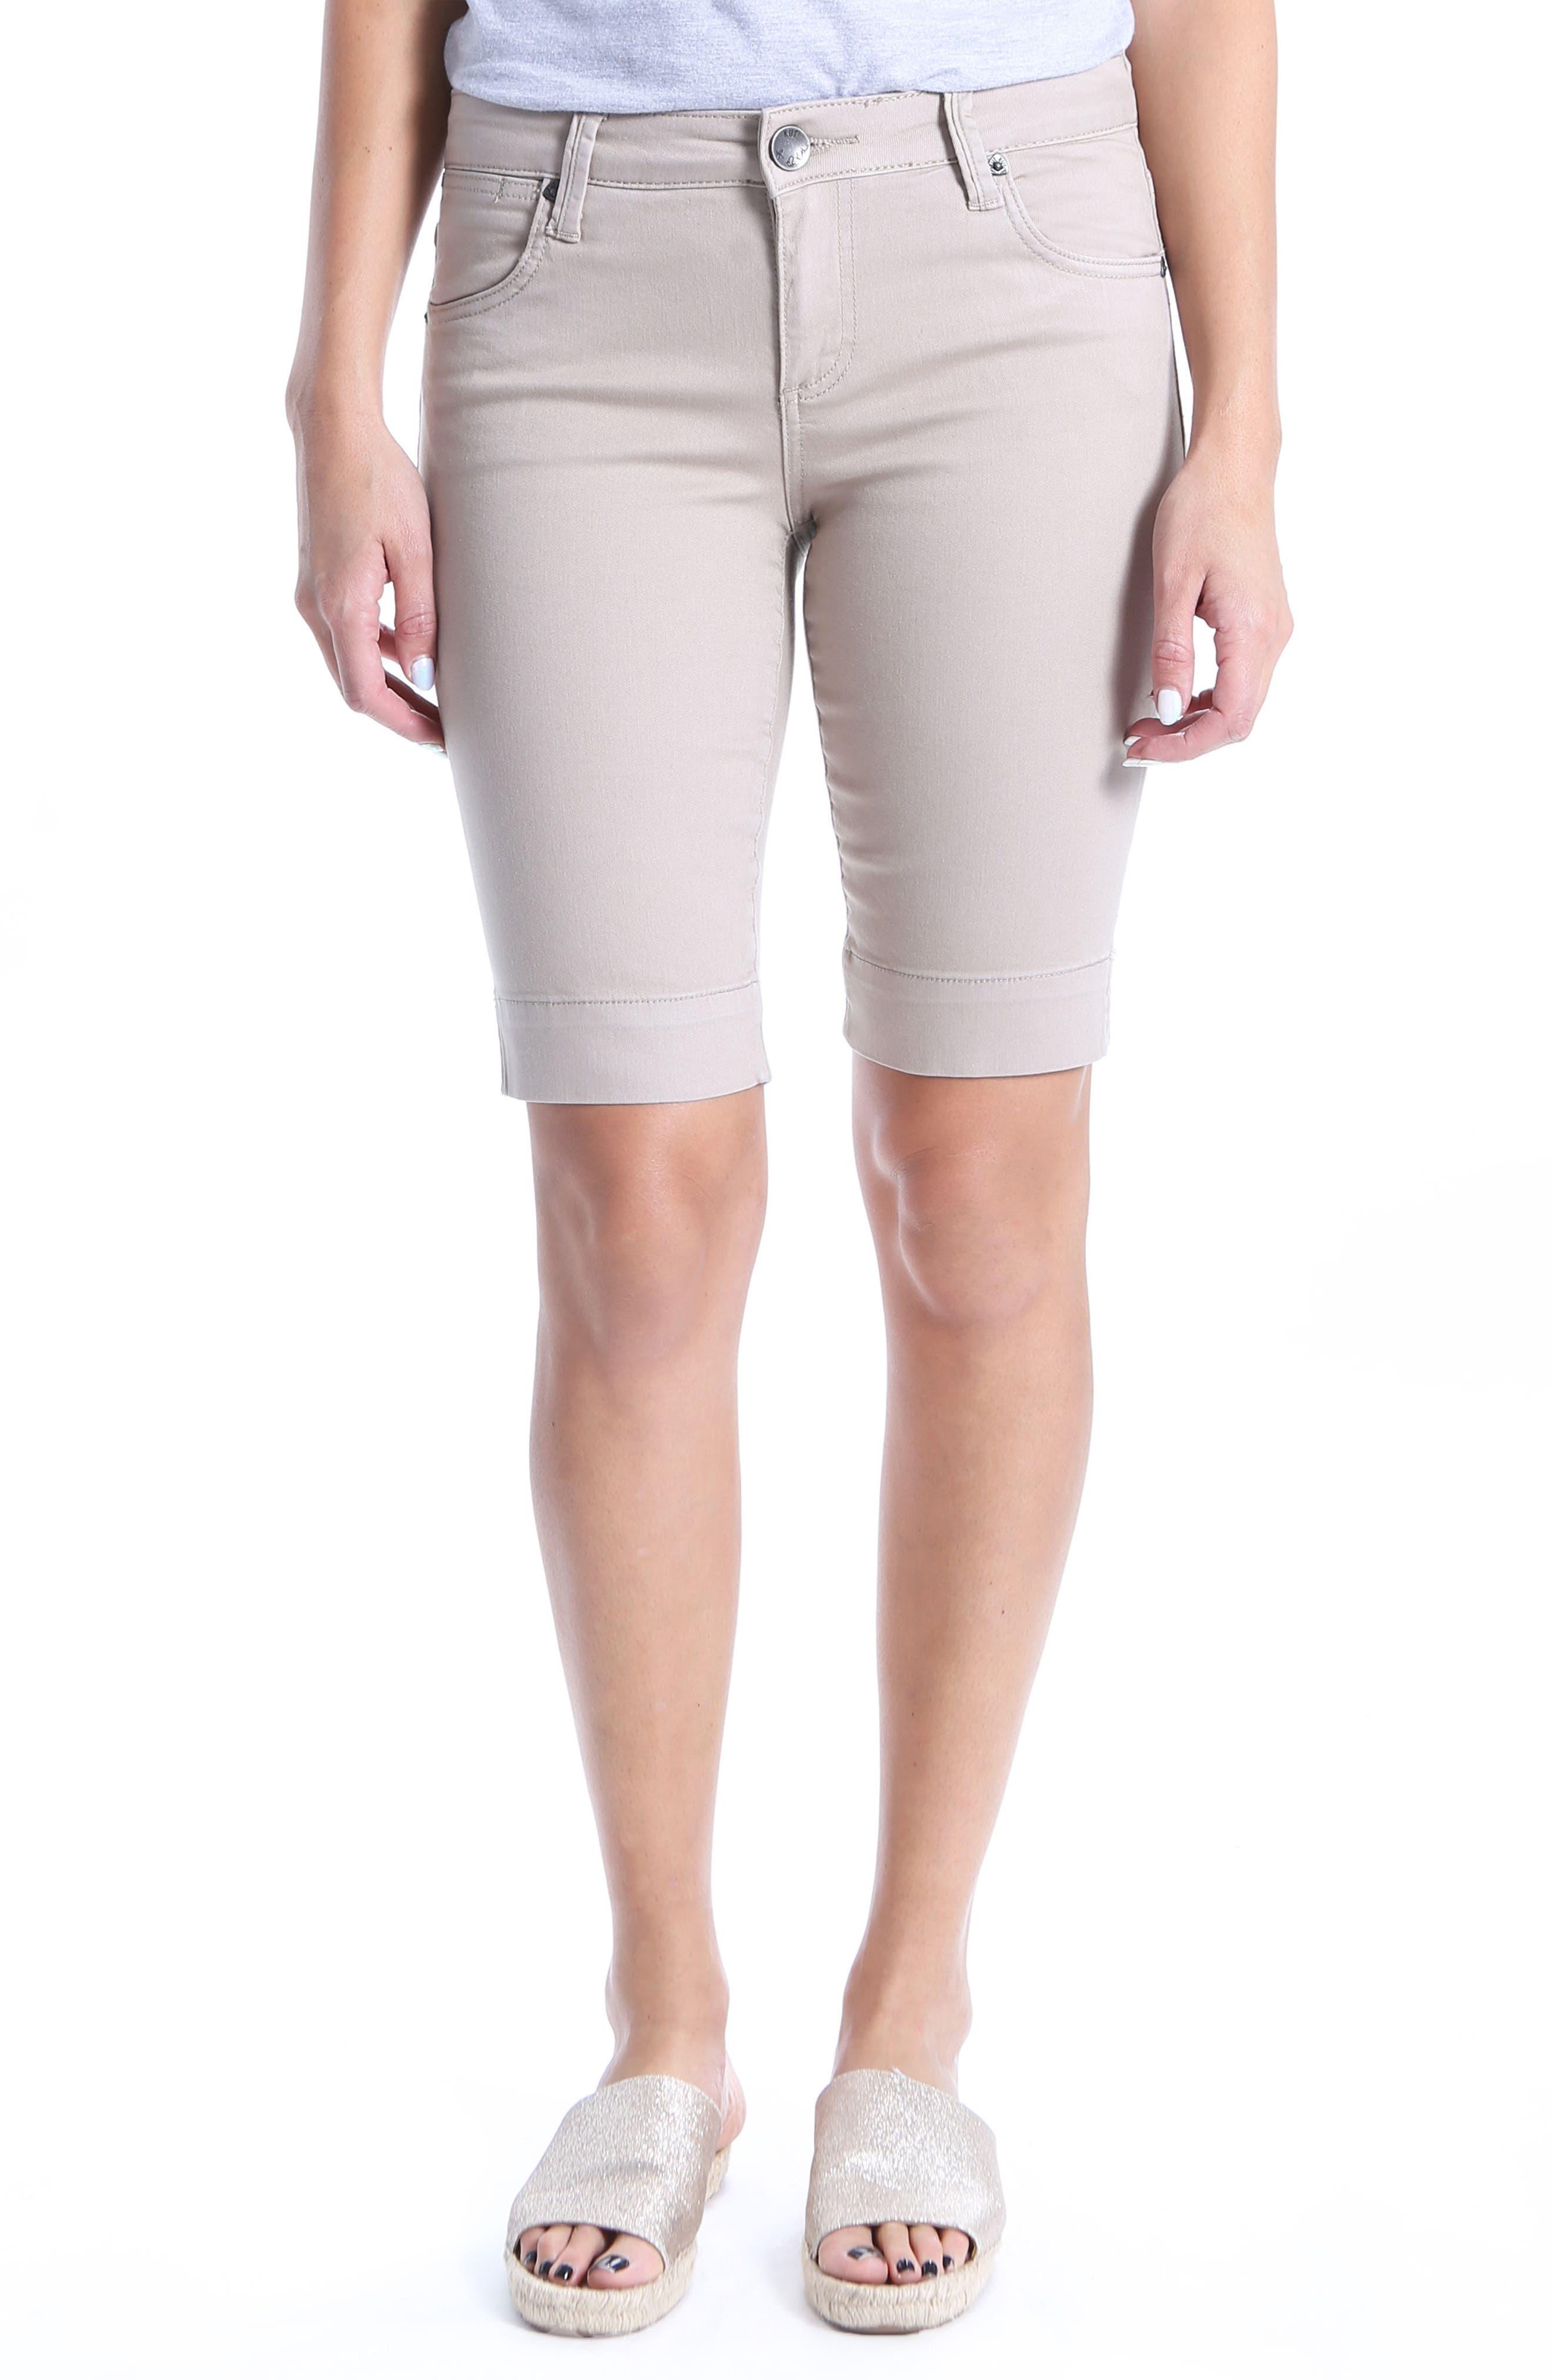 Natalie Bermuda Shorts,                         Main,                         color, Light Taupe